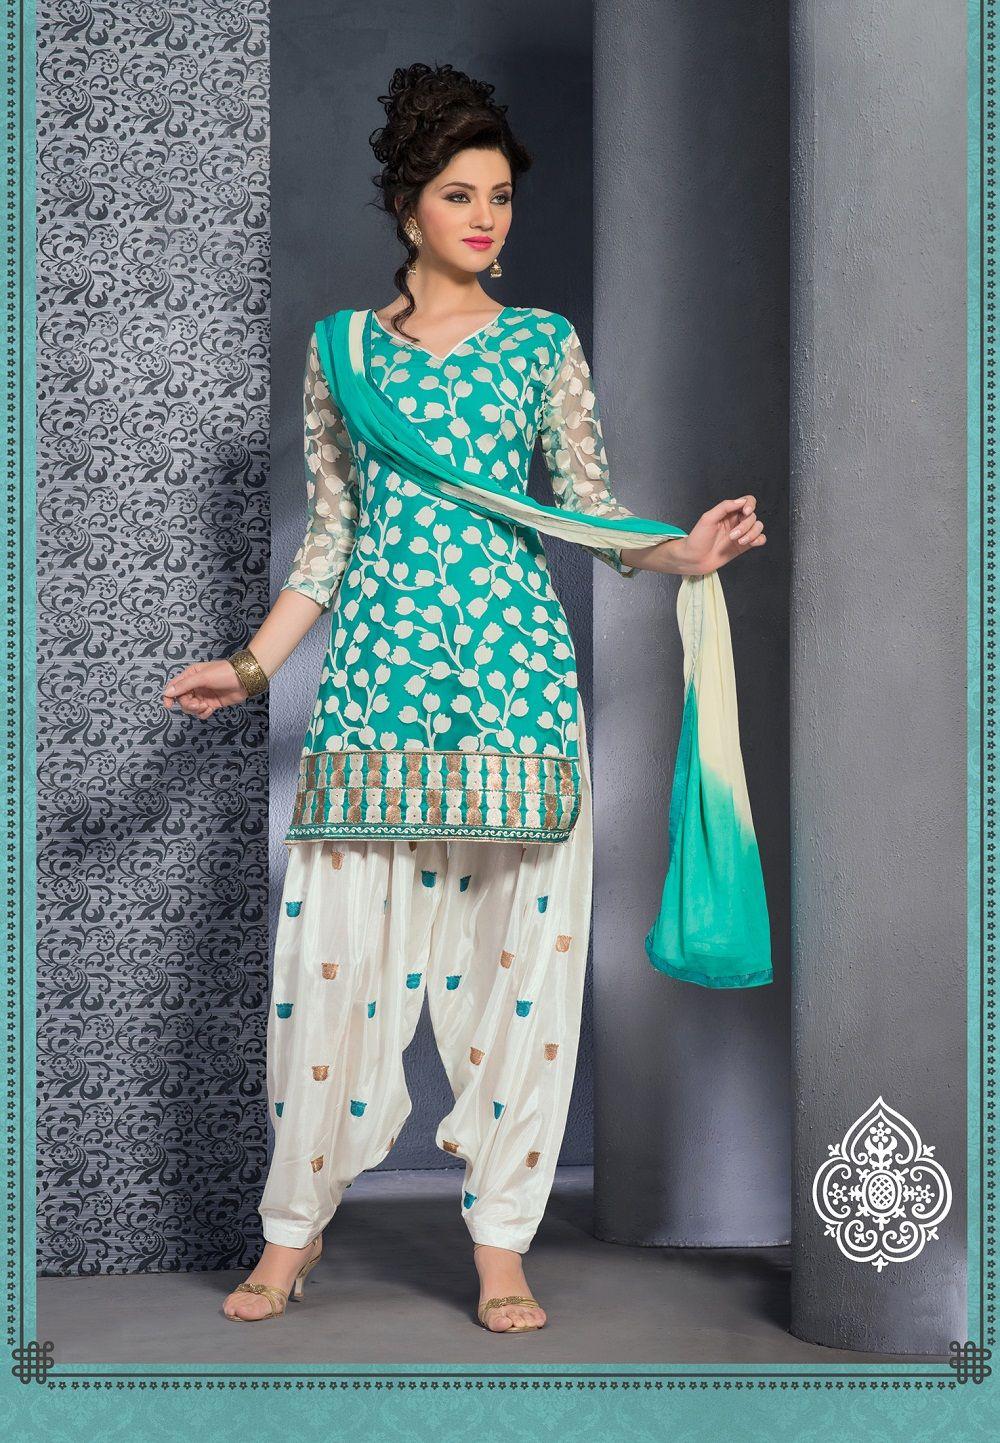 Sky blue super net designer punjabisuit comes with for Dress dizain photo